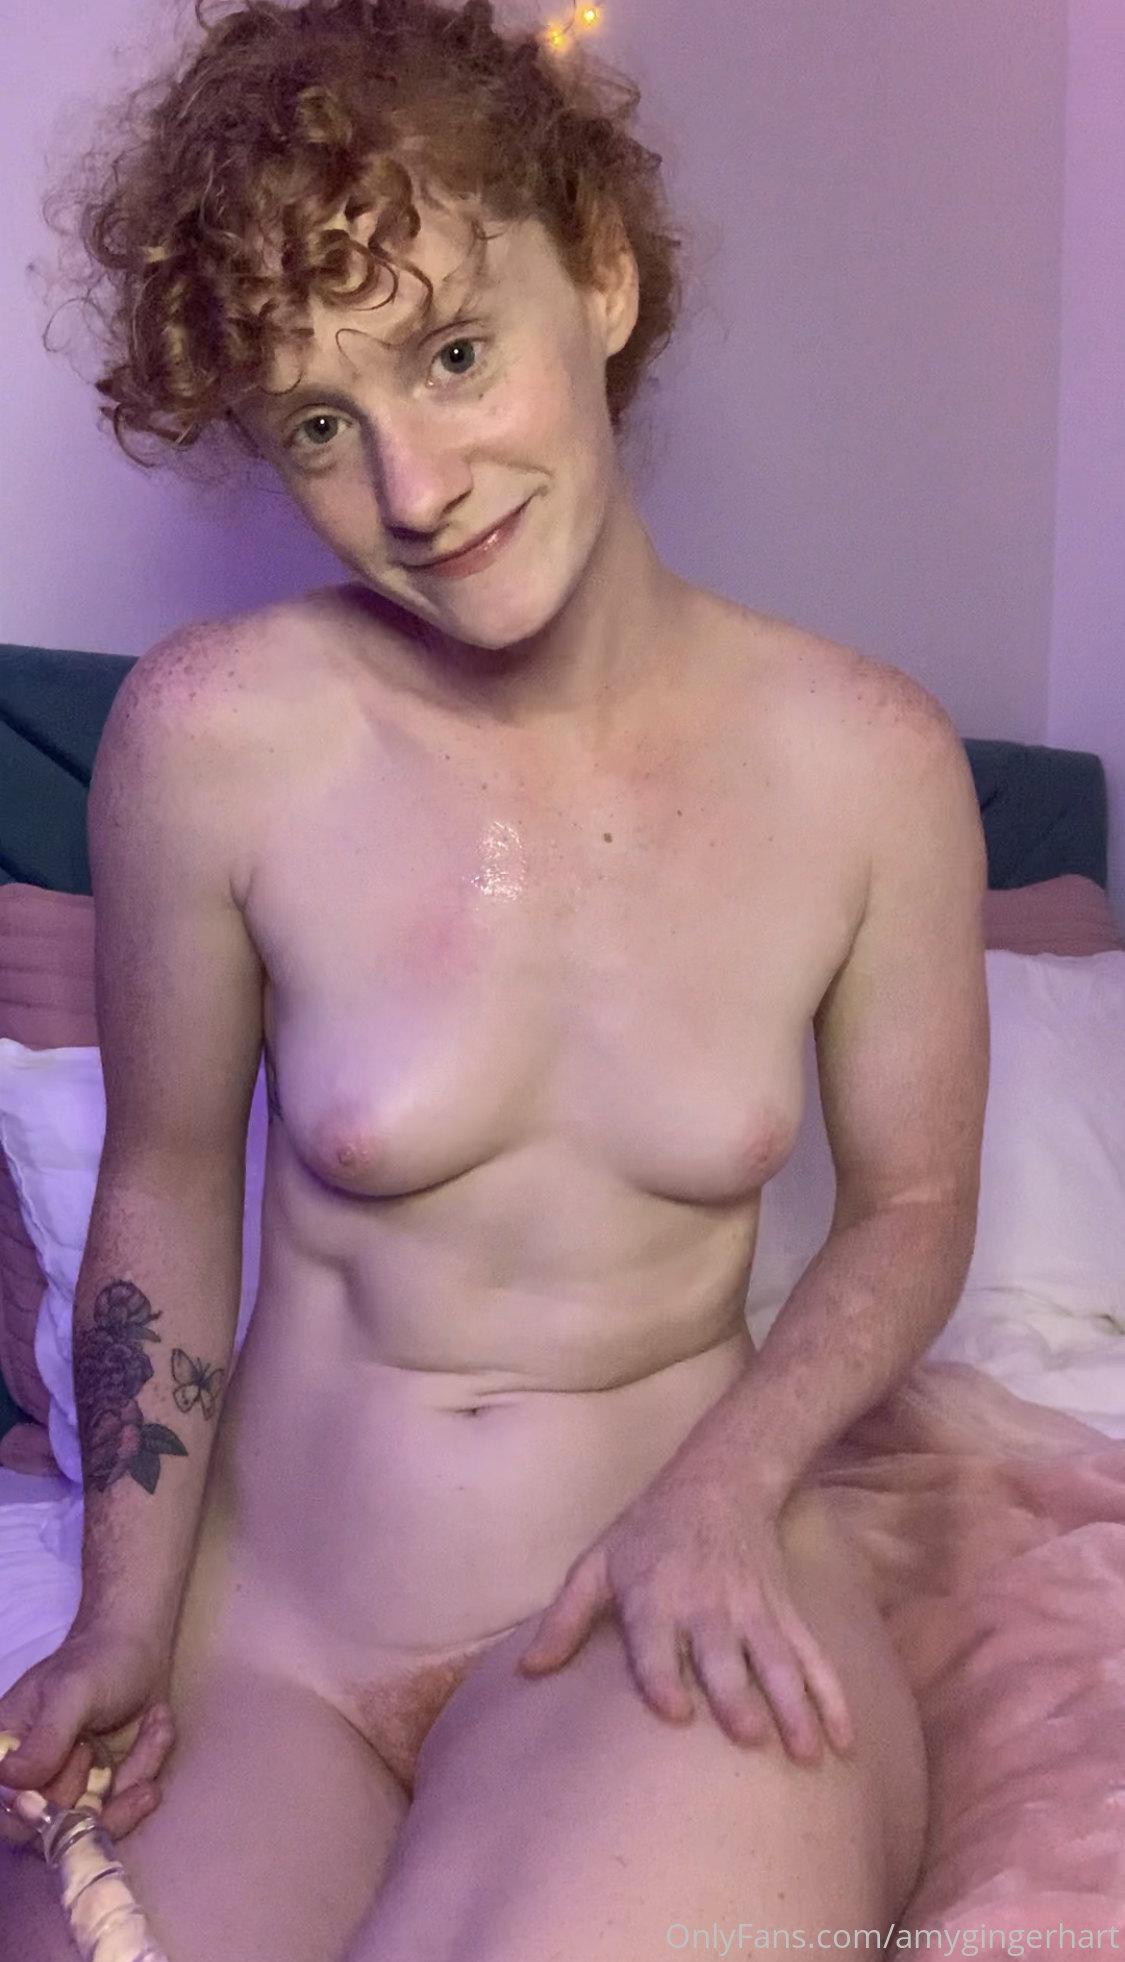 Amy Hart, Amygingerhart, Onlyfans 0181